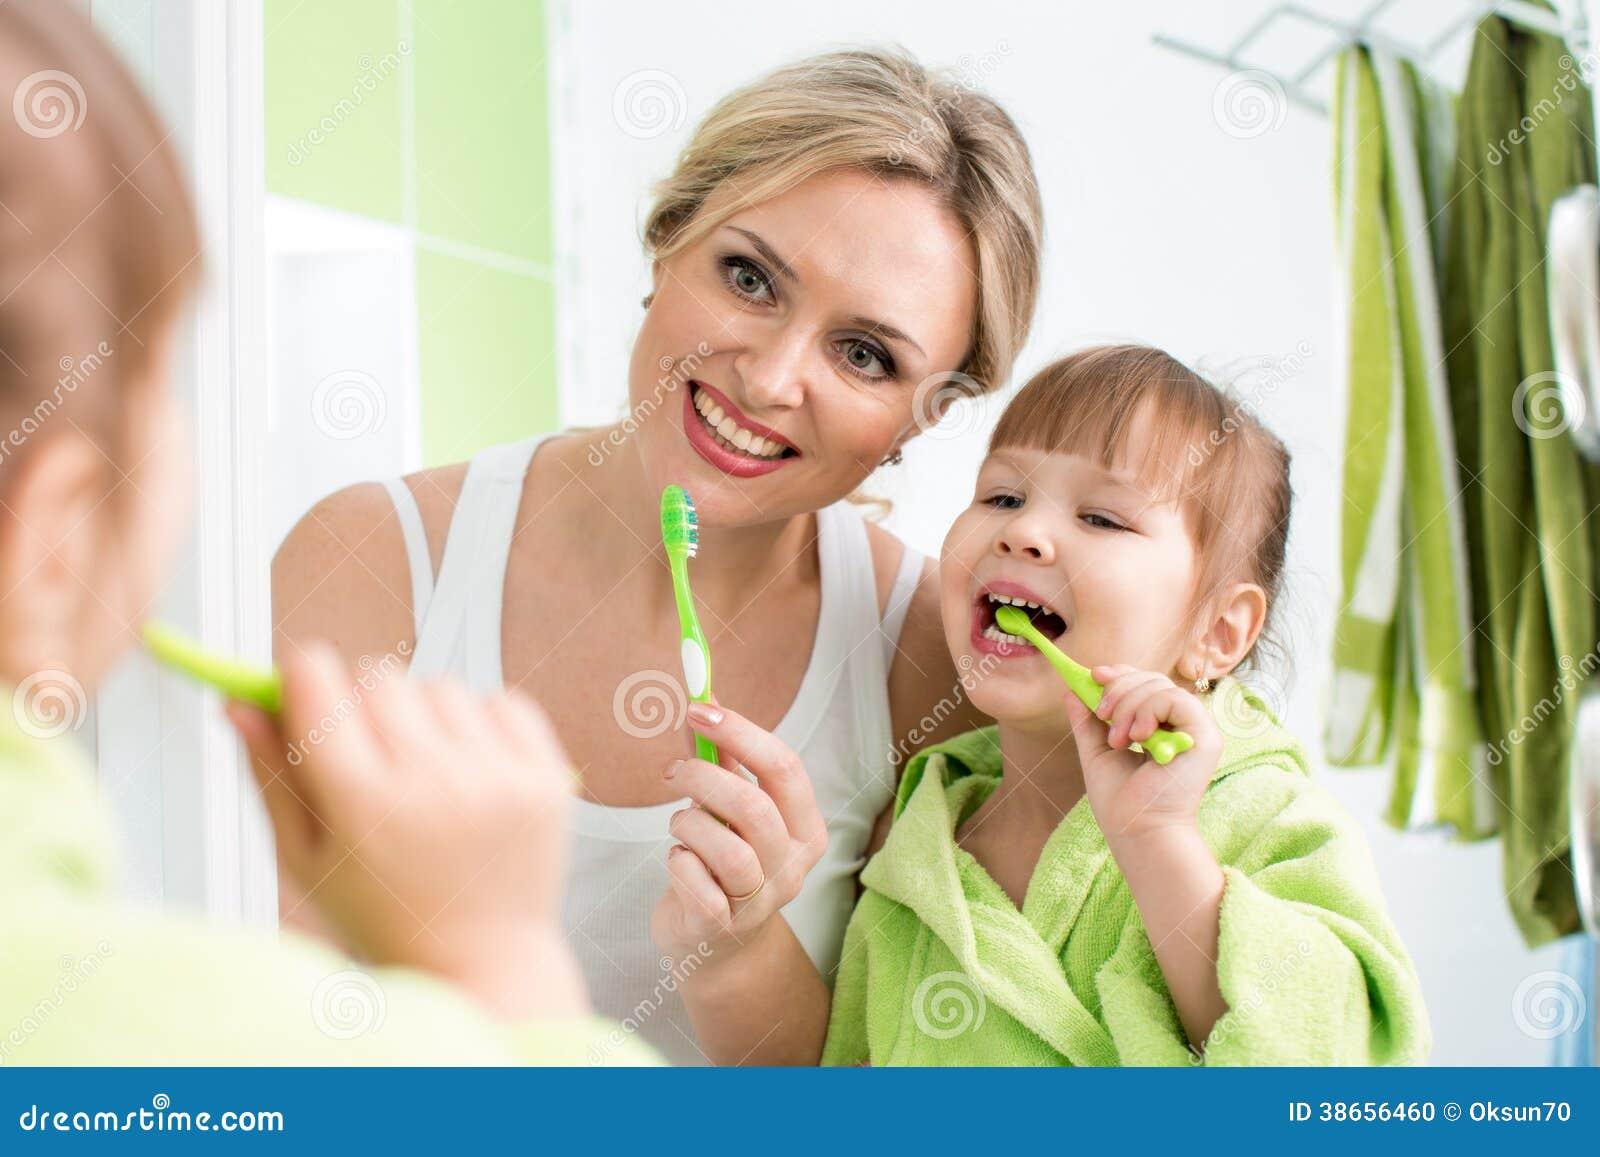 Kid Girl With Mom Washing In Bathroom Stock Photography